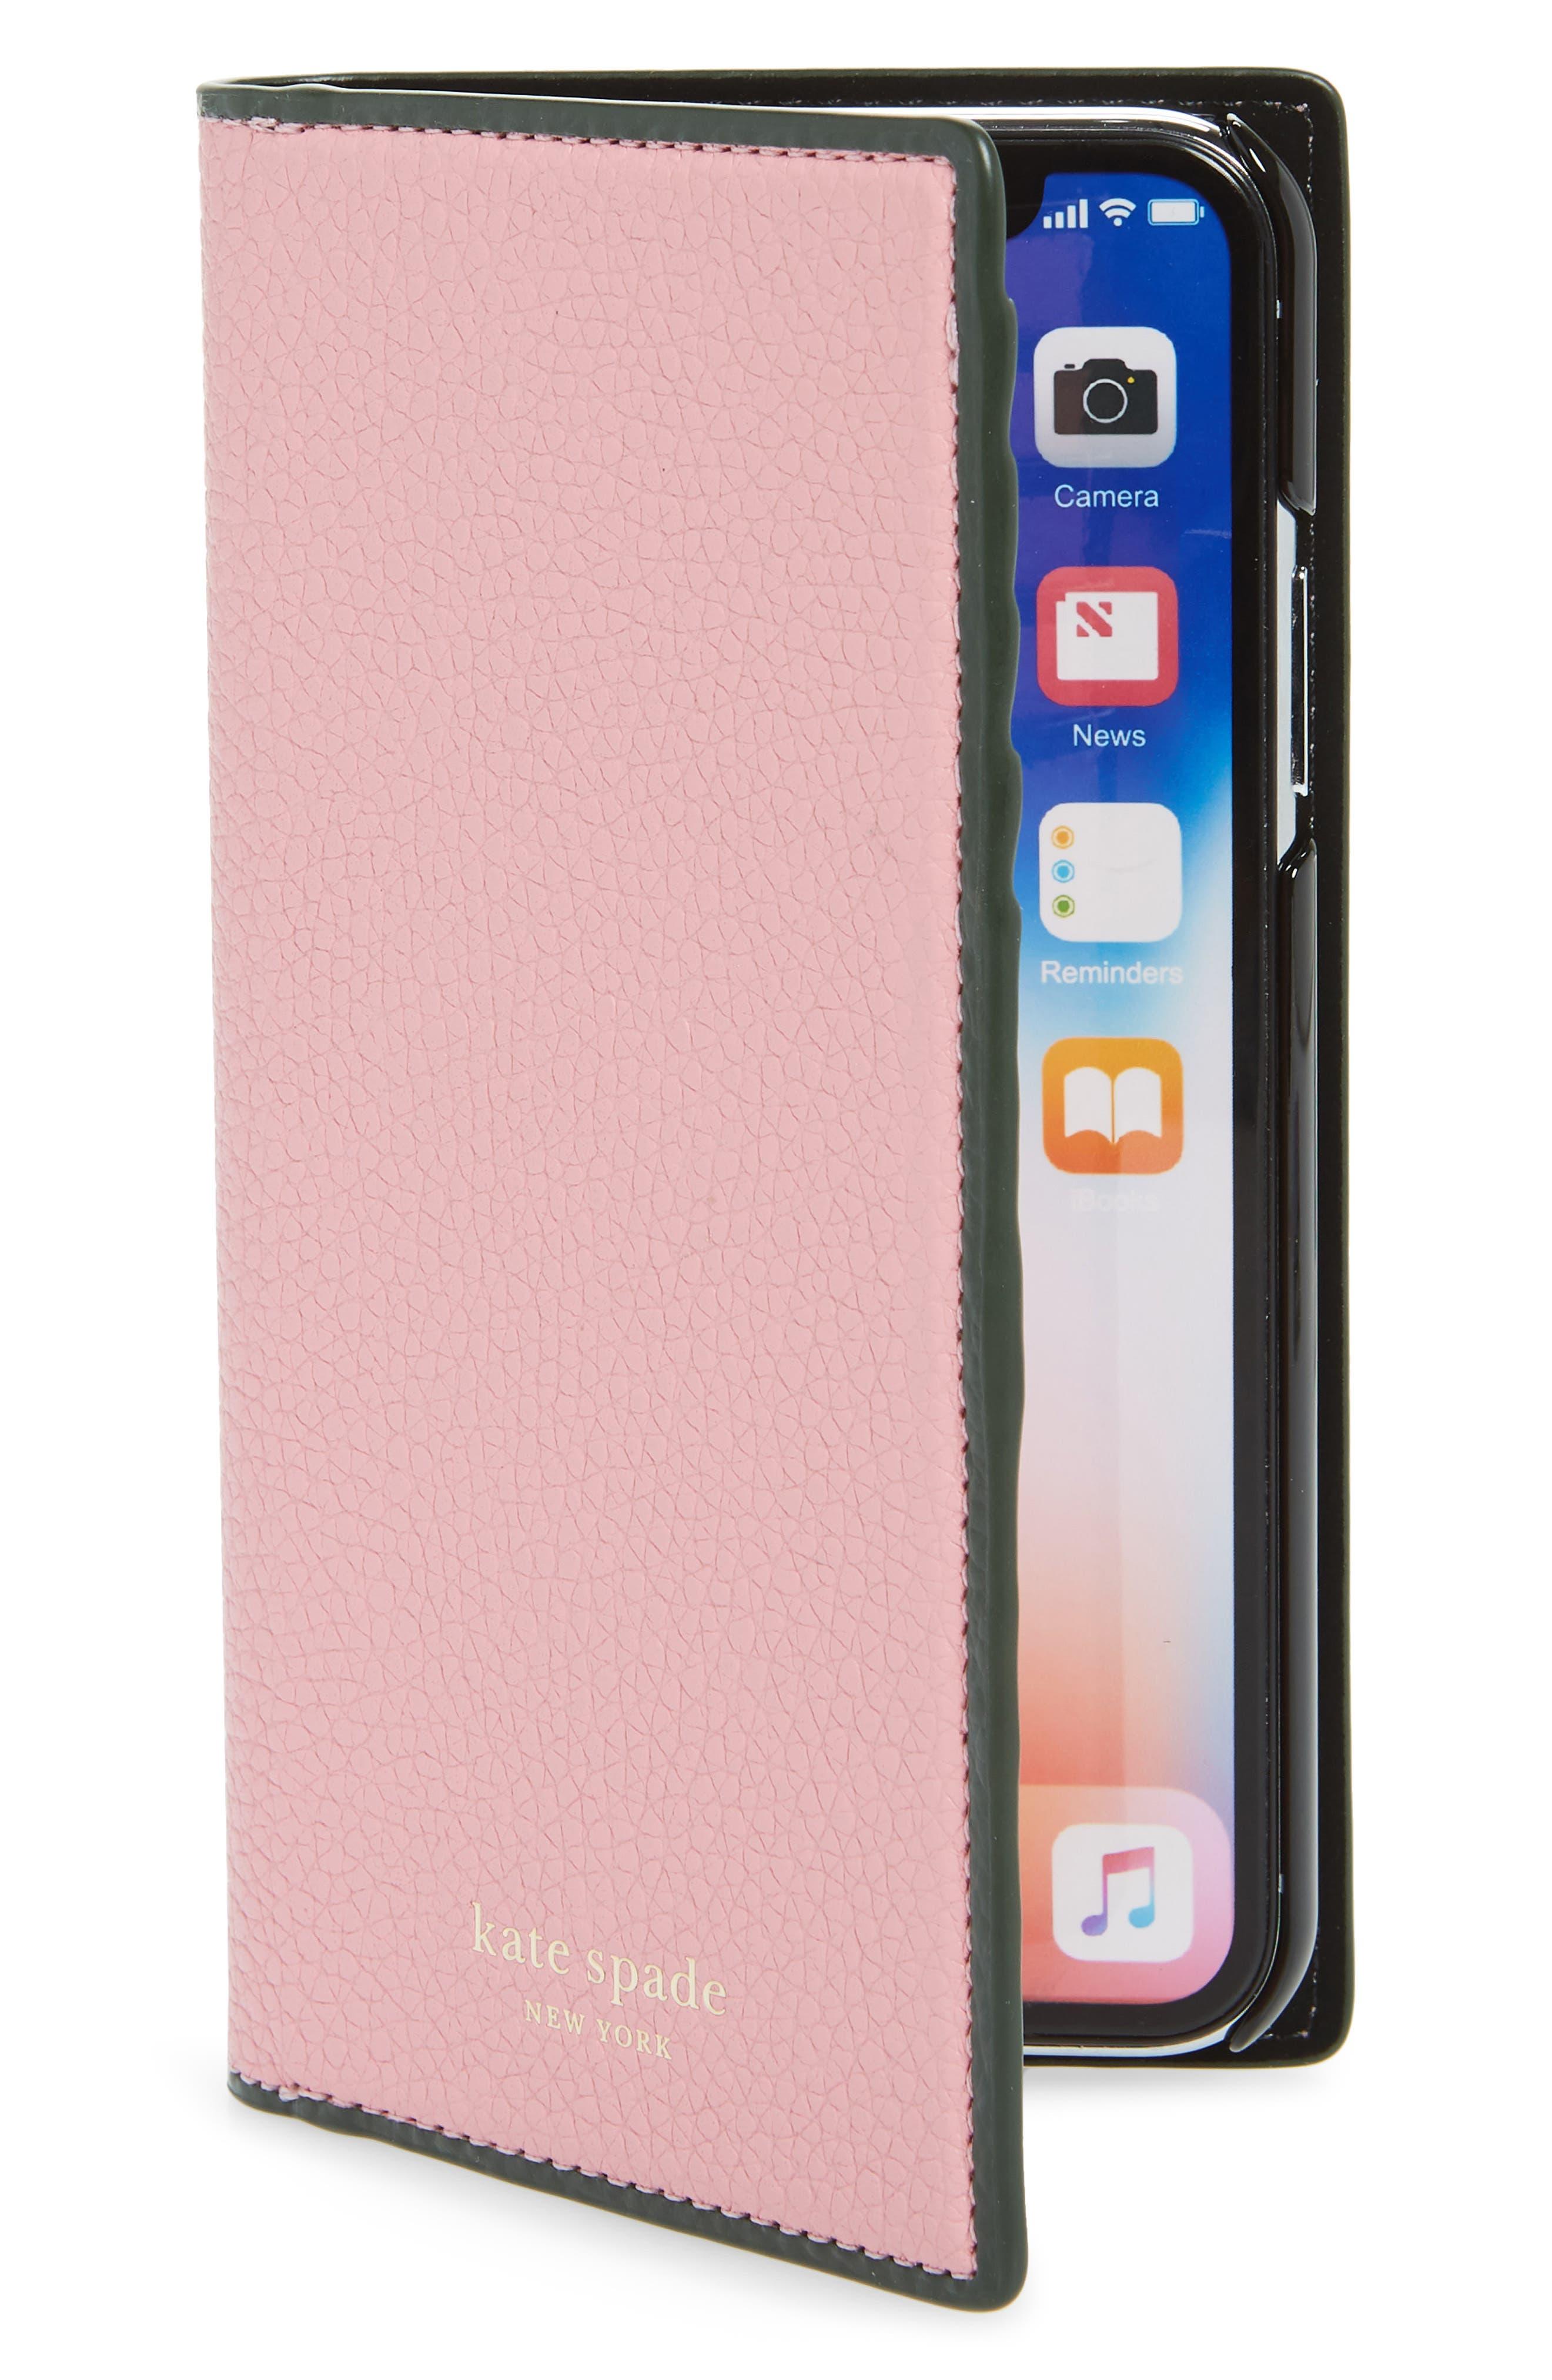 iphone x cell phone casesIphone X Designer Cases Fashion Case Iphone X Customize Phone Cases For Iphone X Make Custom Iphone Case Design Iphone 6 Case Louis Vuitton #16